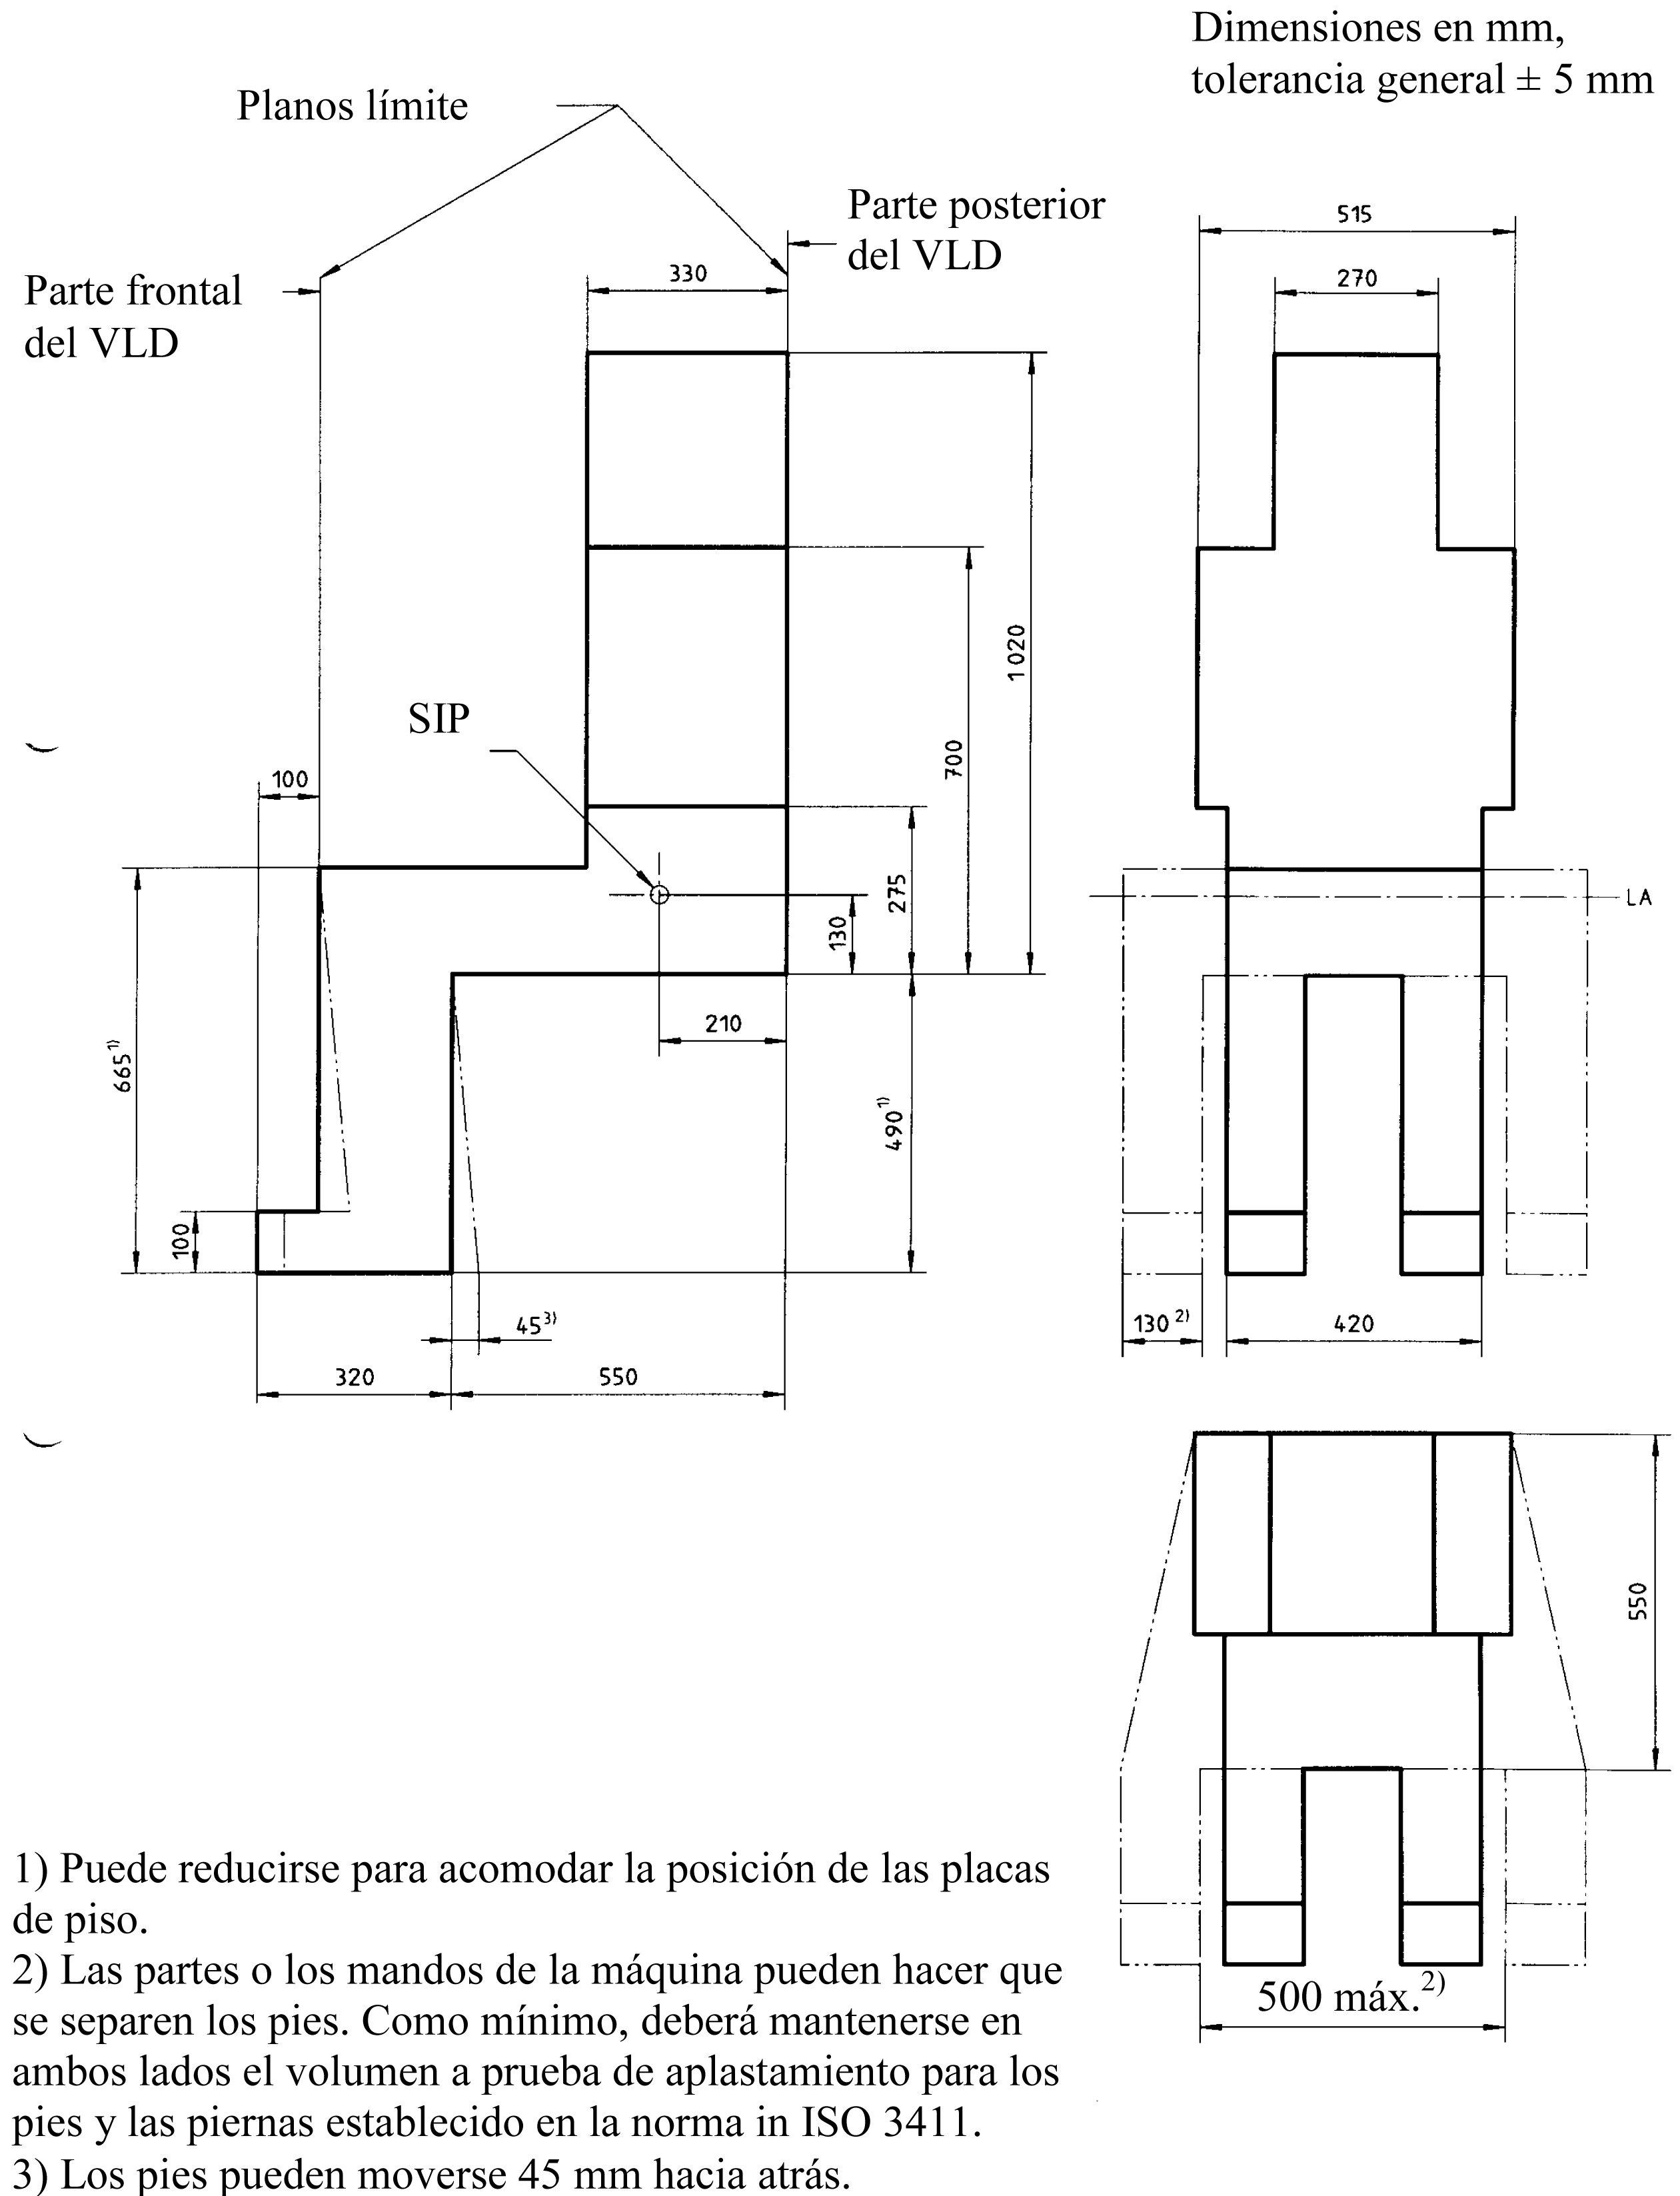 EUR-Lex - 02014R1322-20161014 - EN - EUR-Lex